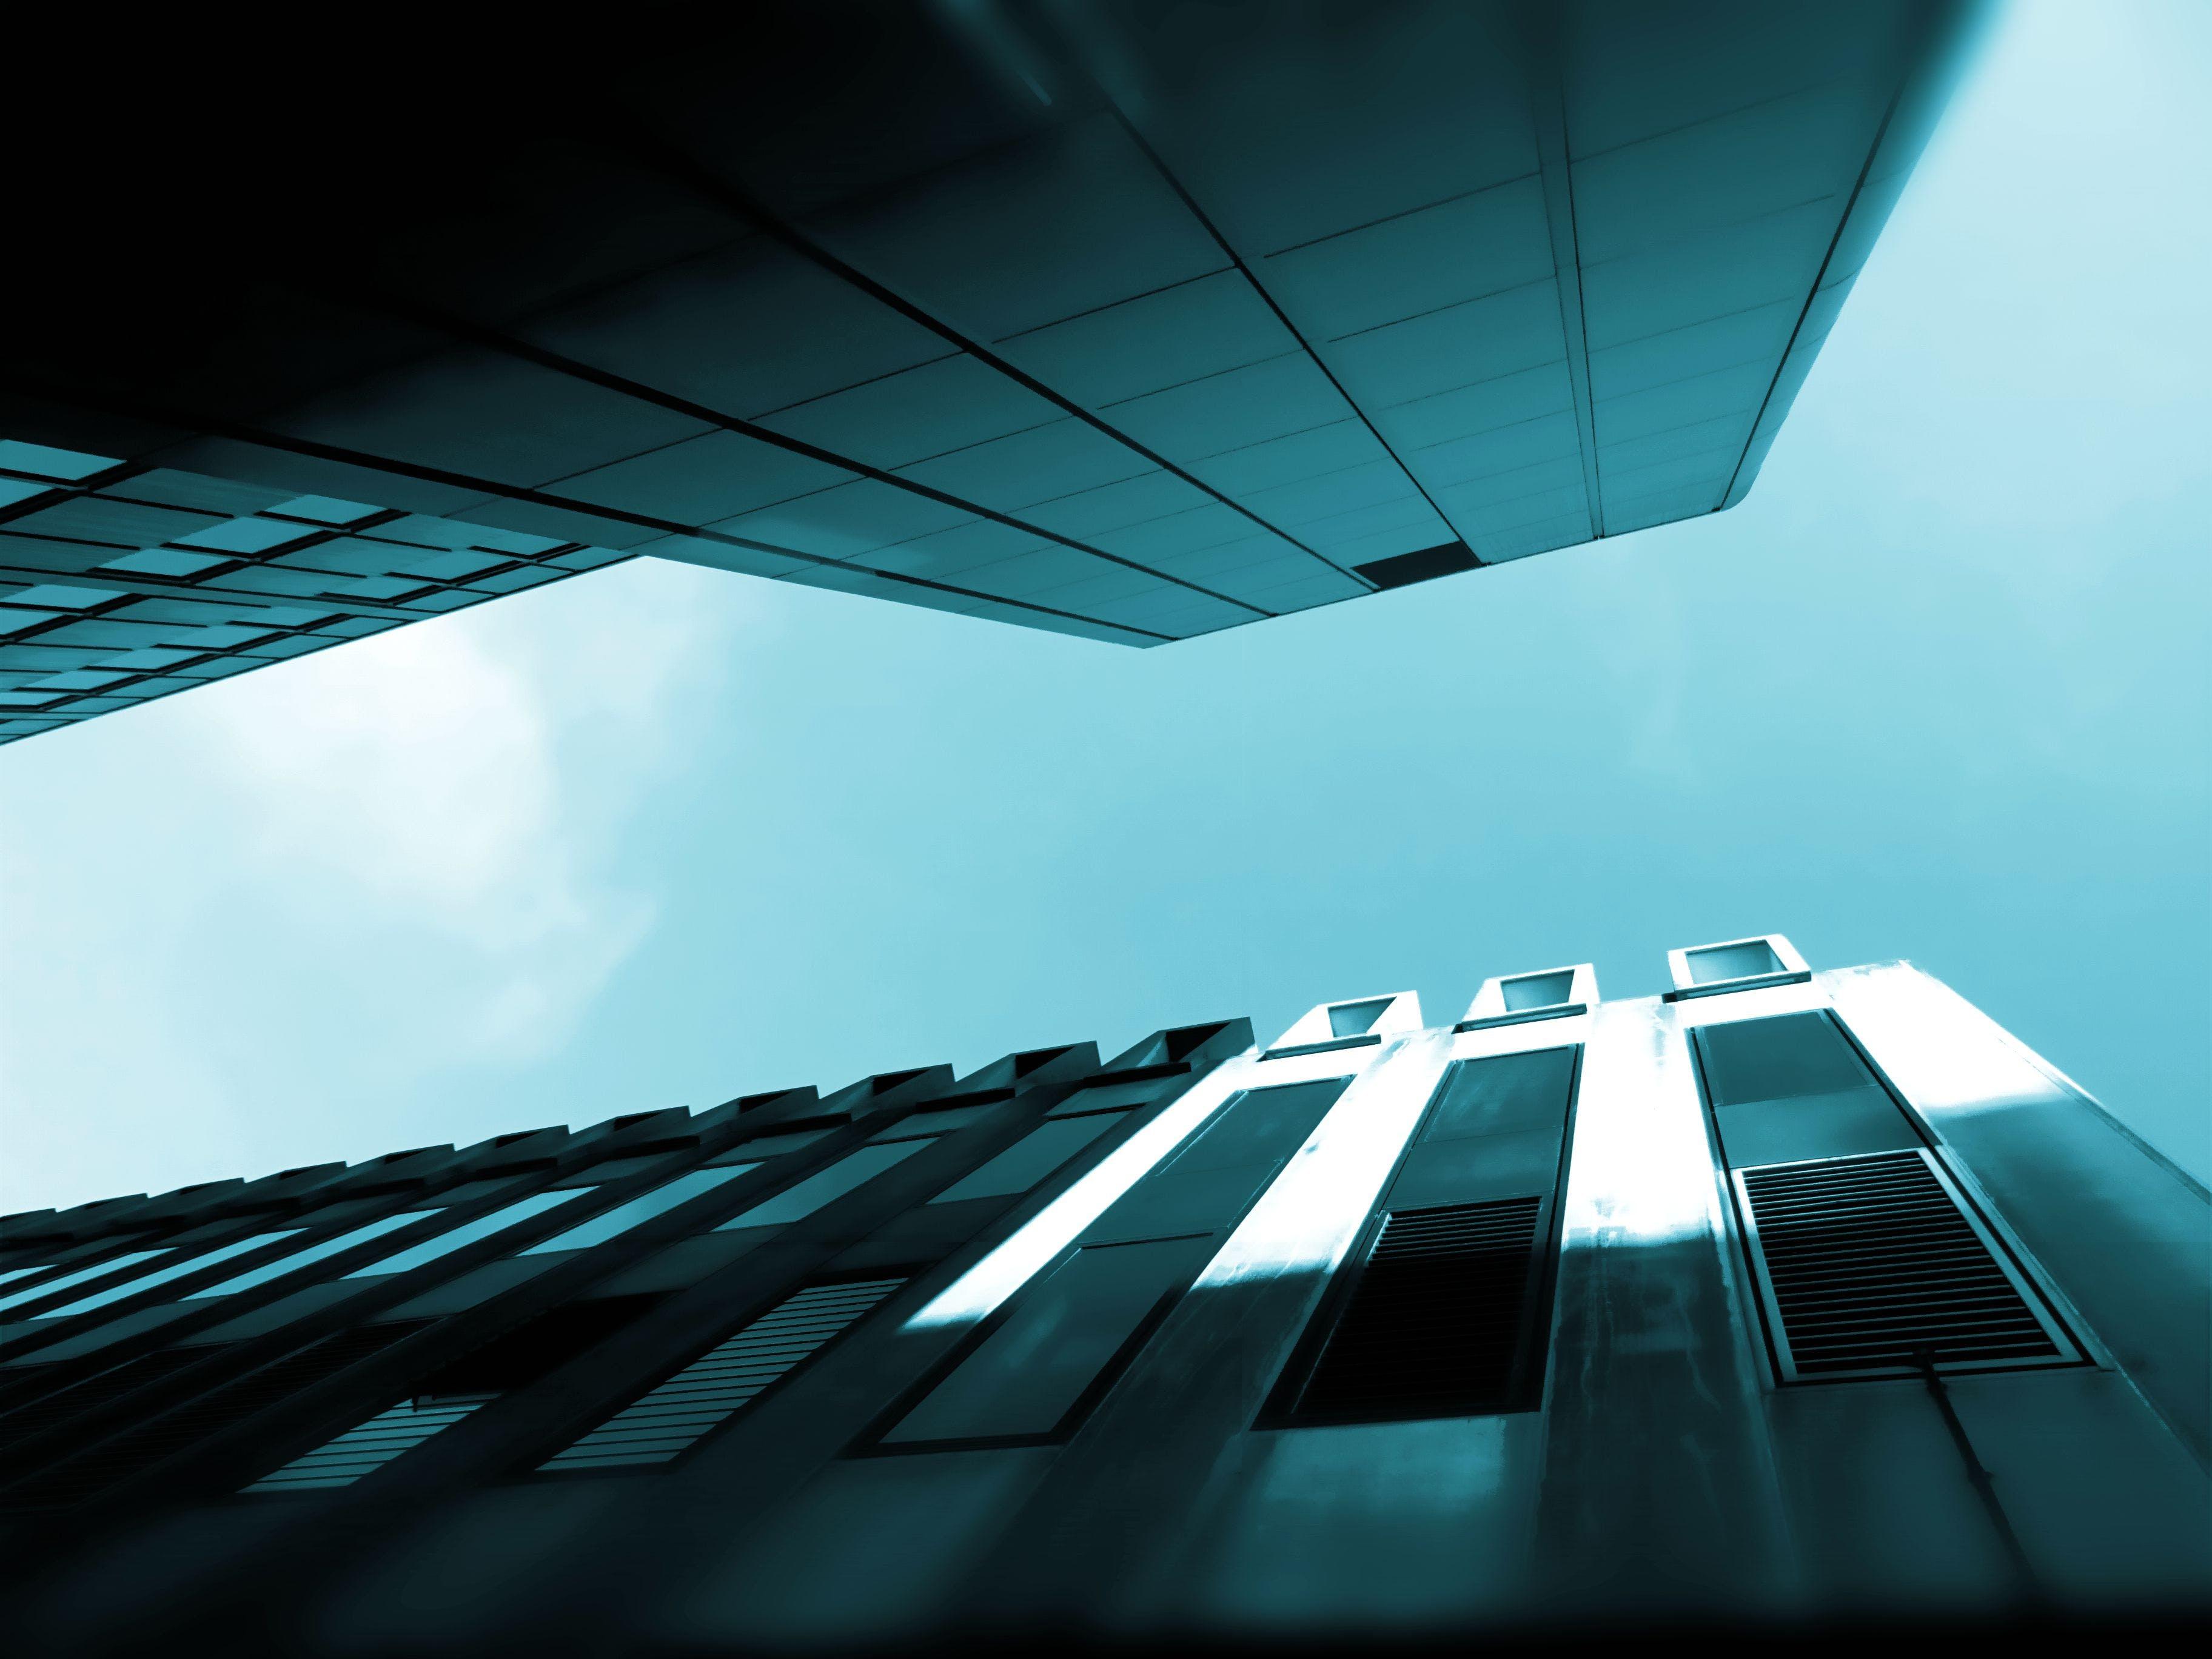 architect, architectural design, building